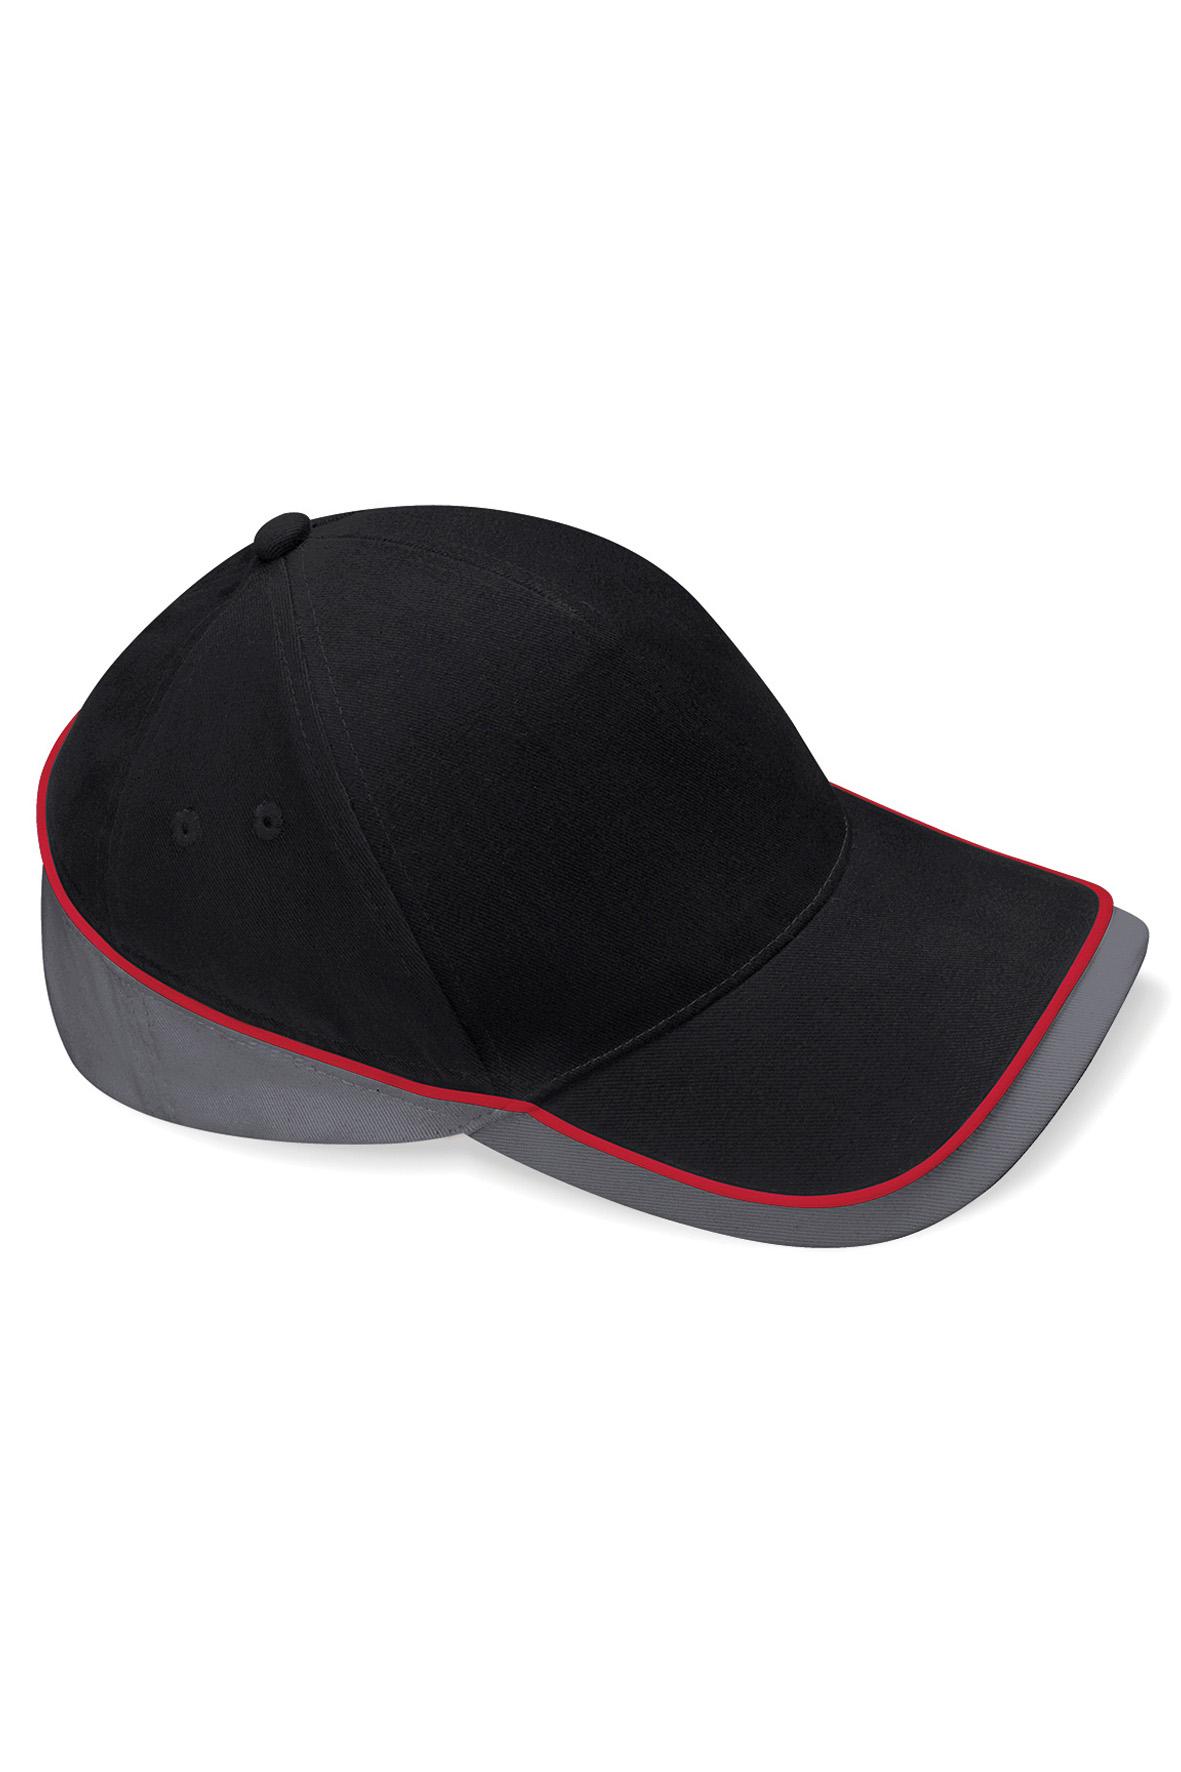 Teamwear Lippis Musta - Grafiitti - Classic Red